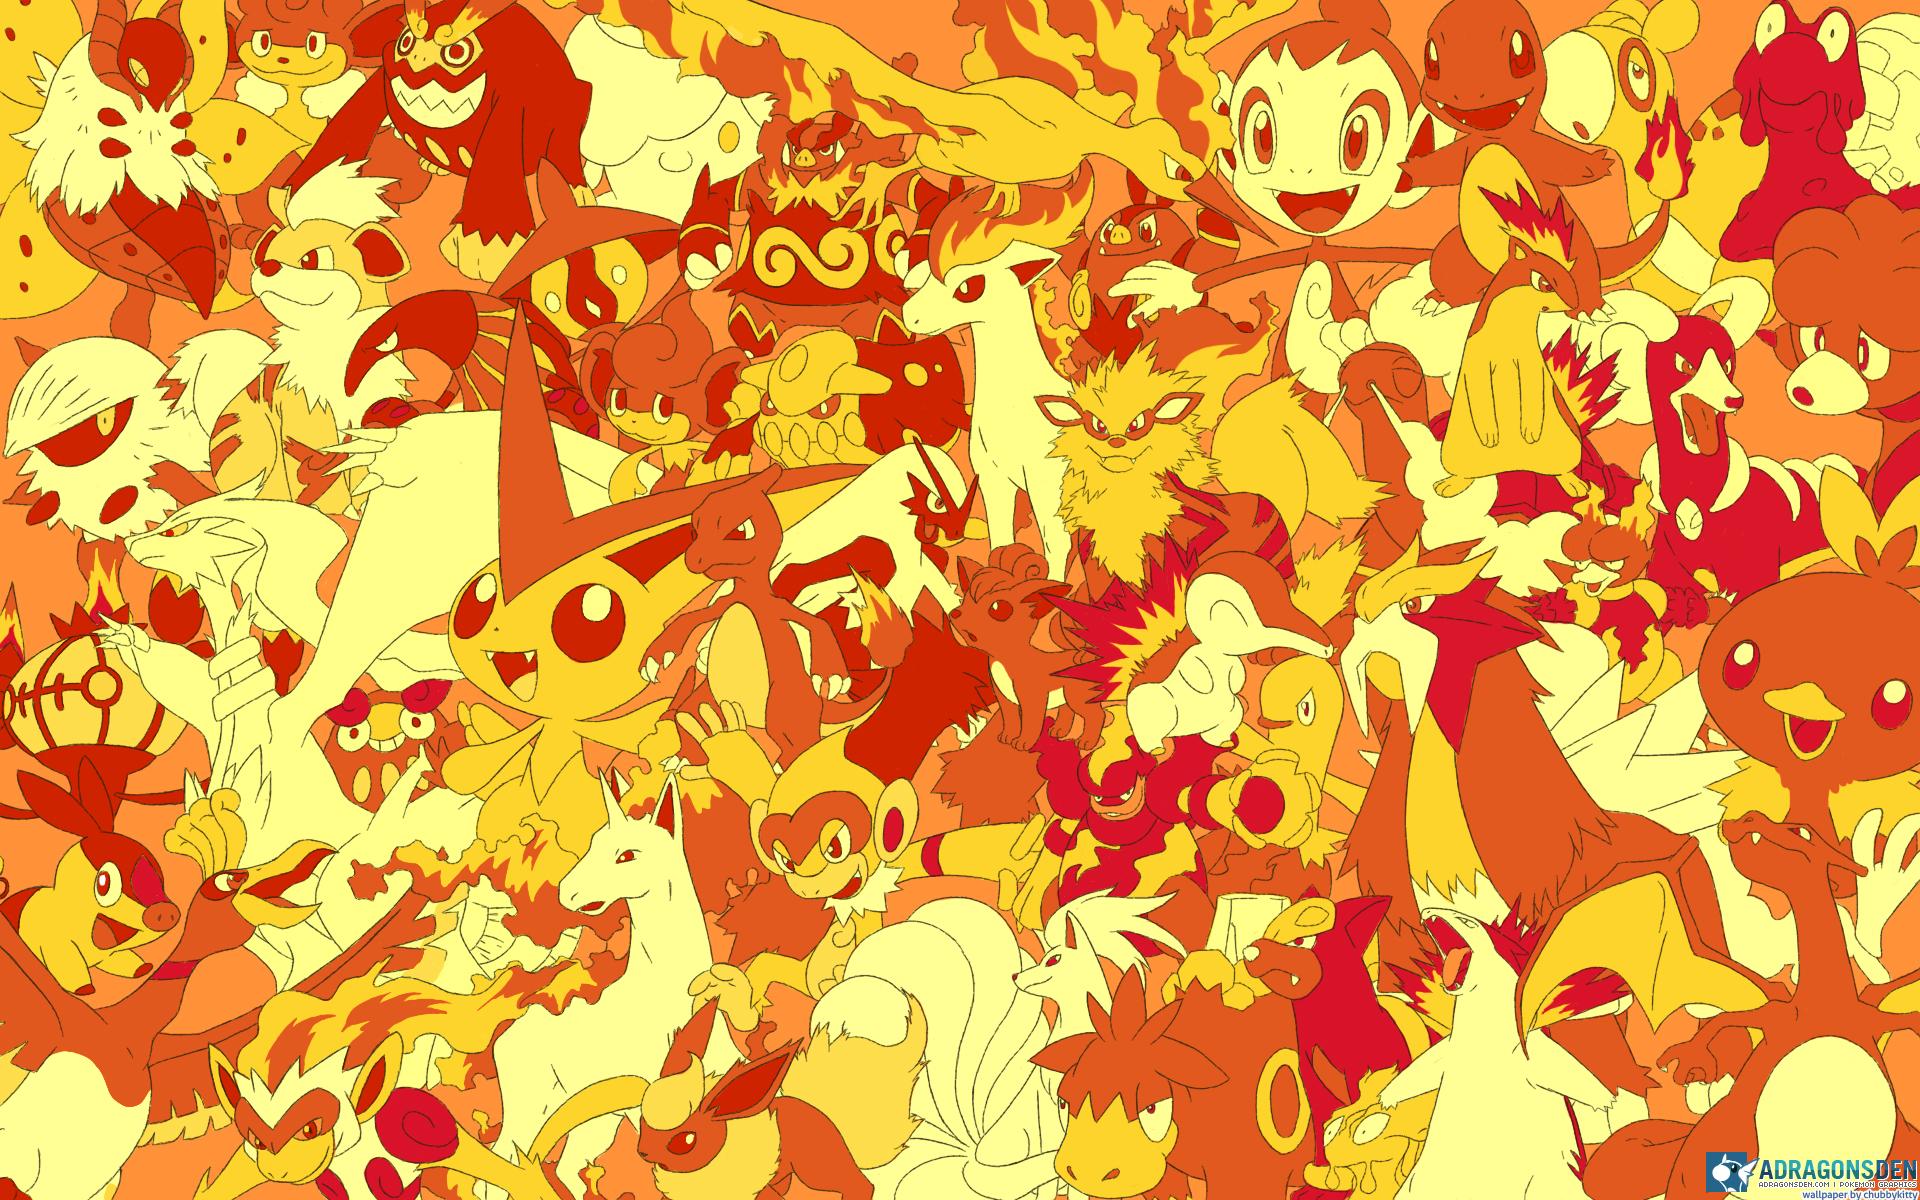 покемон Hd обои фон 1920x1200 Id723281 Wallpaper Abyss